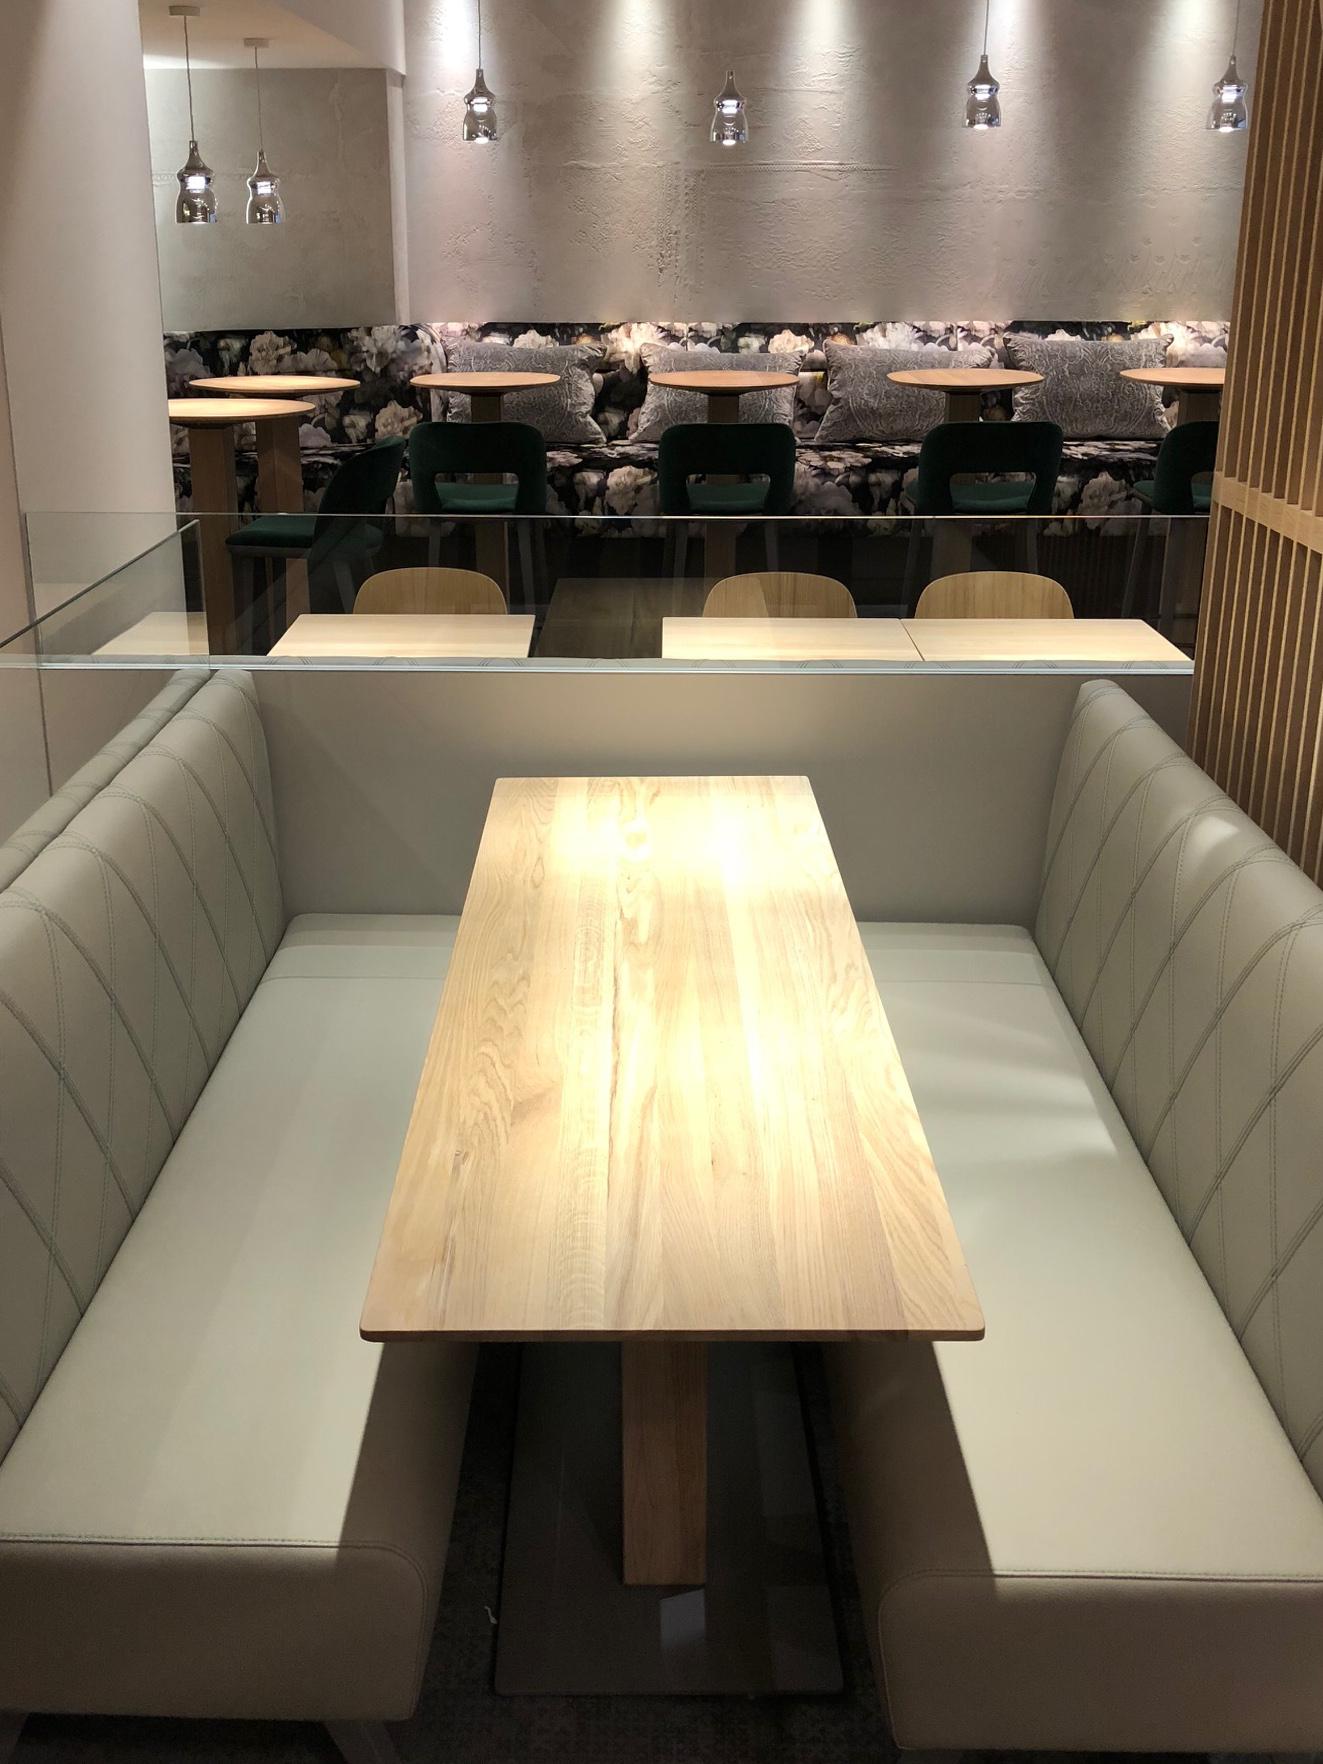 Shopbau Ladenbau Gastro Projektentwicklung Projetsteuerung Projektbau